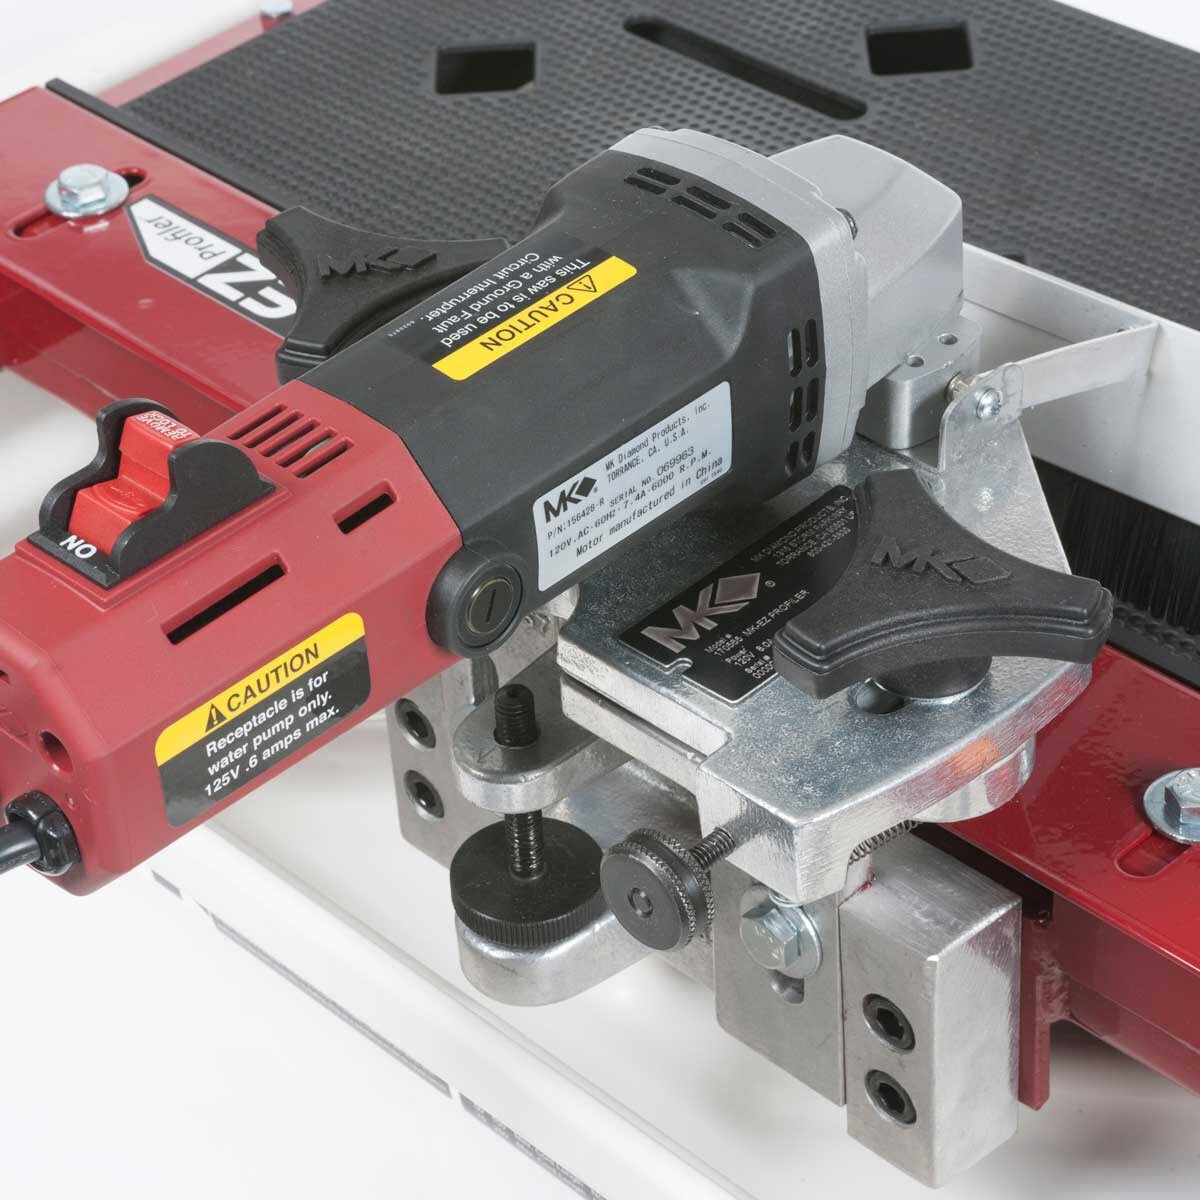 MK EZ Profiler Motor